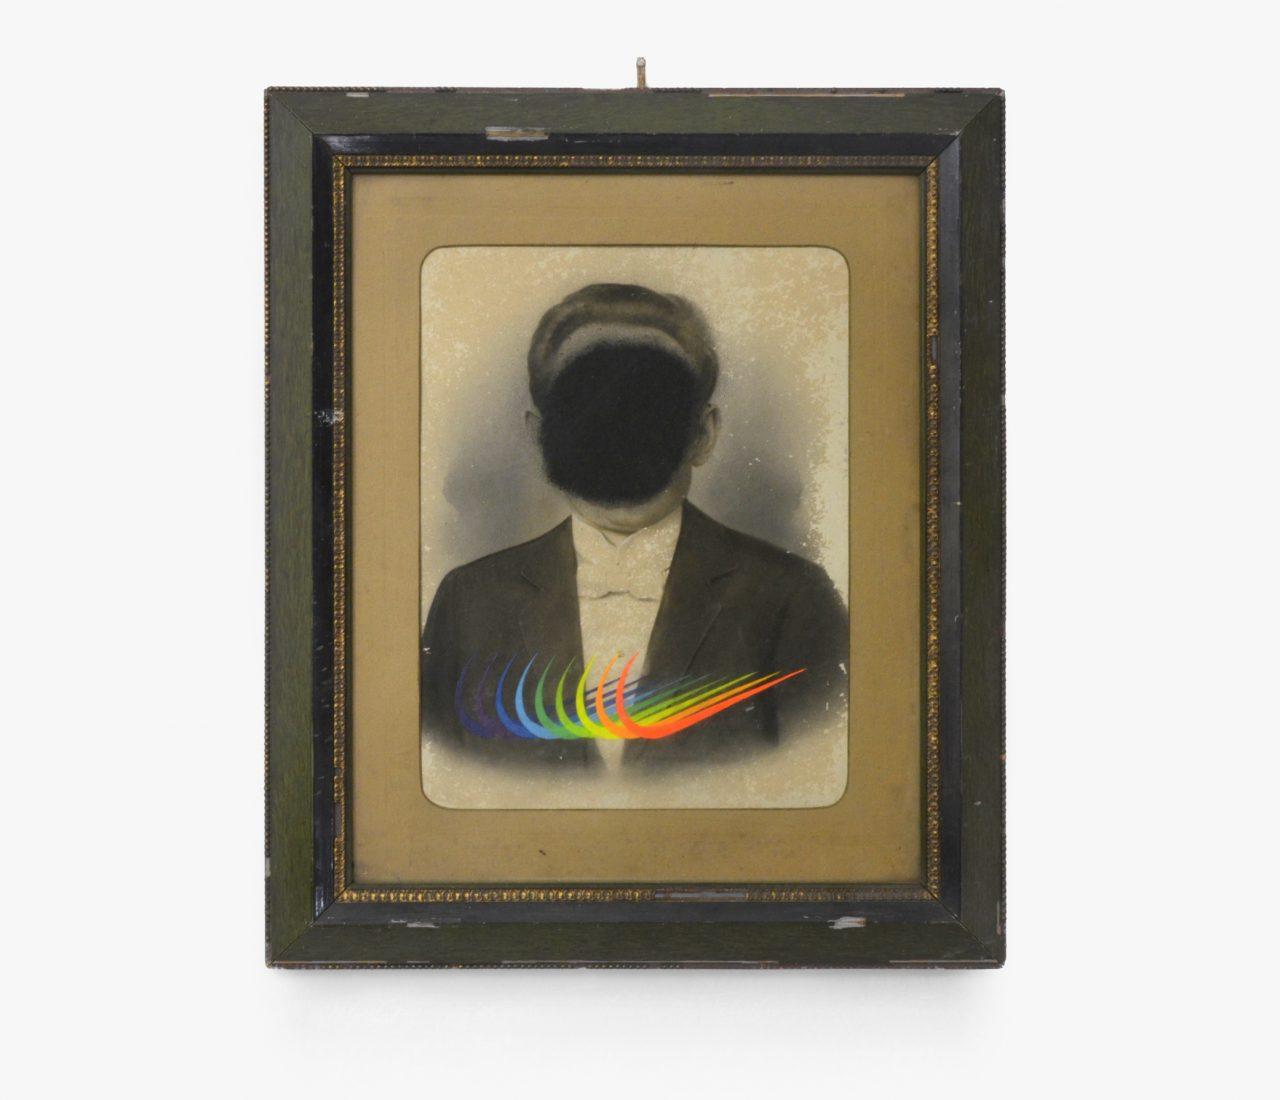 """Weitsicht""– ""Foresight"", 2017, fluorescent paint, acrylic, photography, cardboard, glass, frame, 65 x 55 cm"